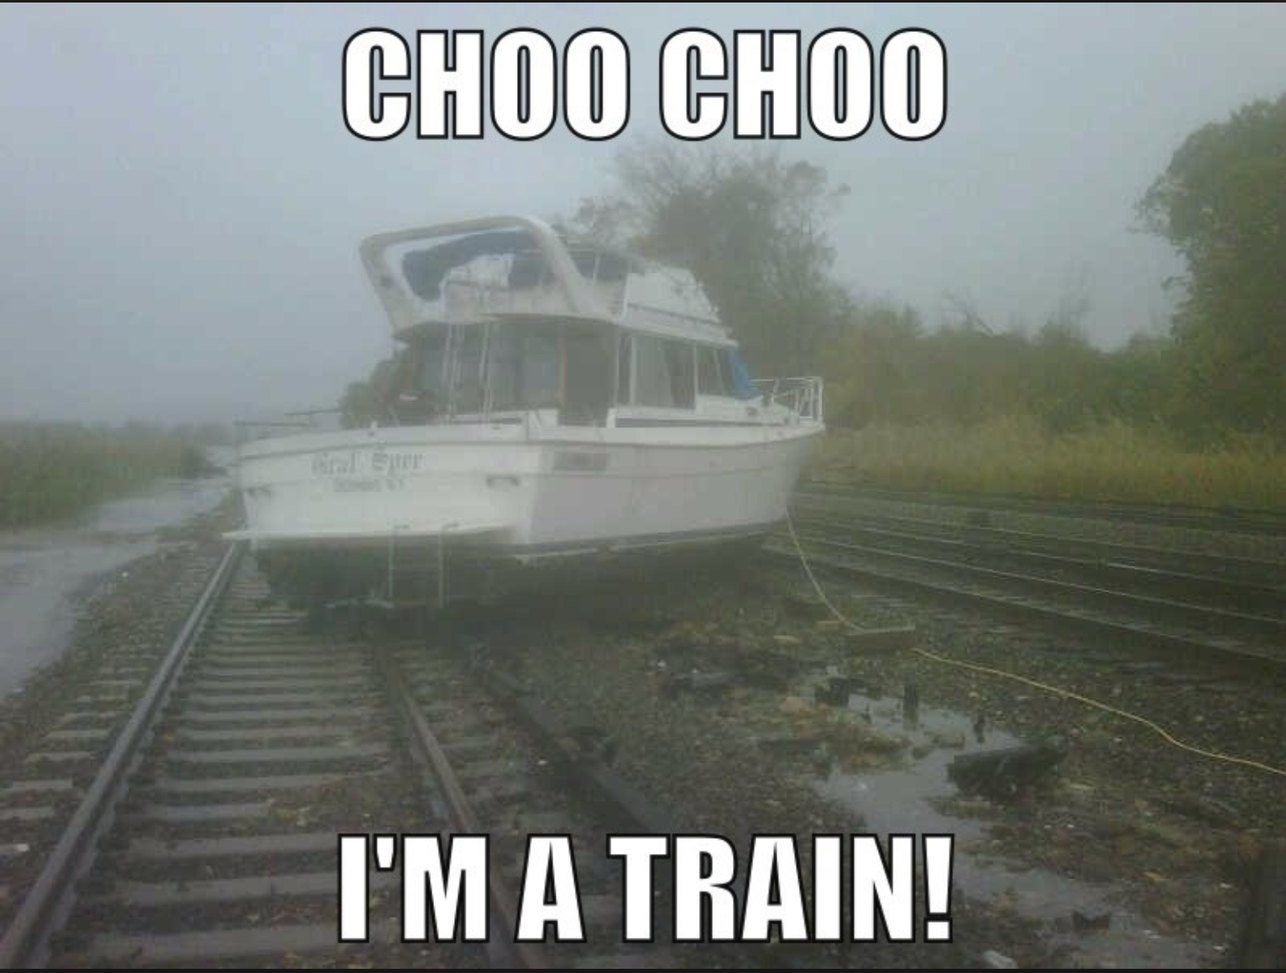 I'm a train! - meme